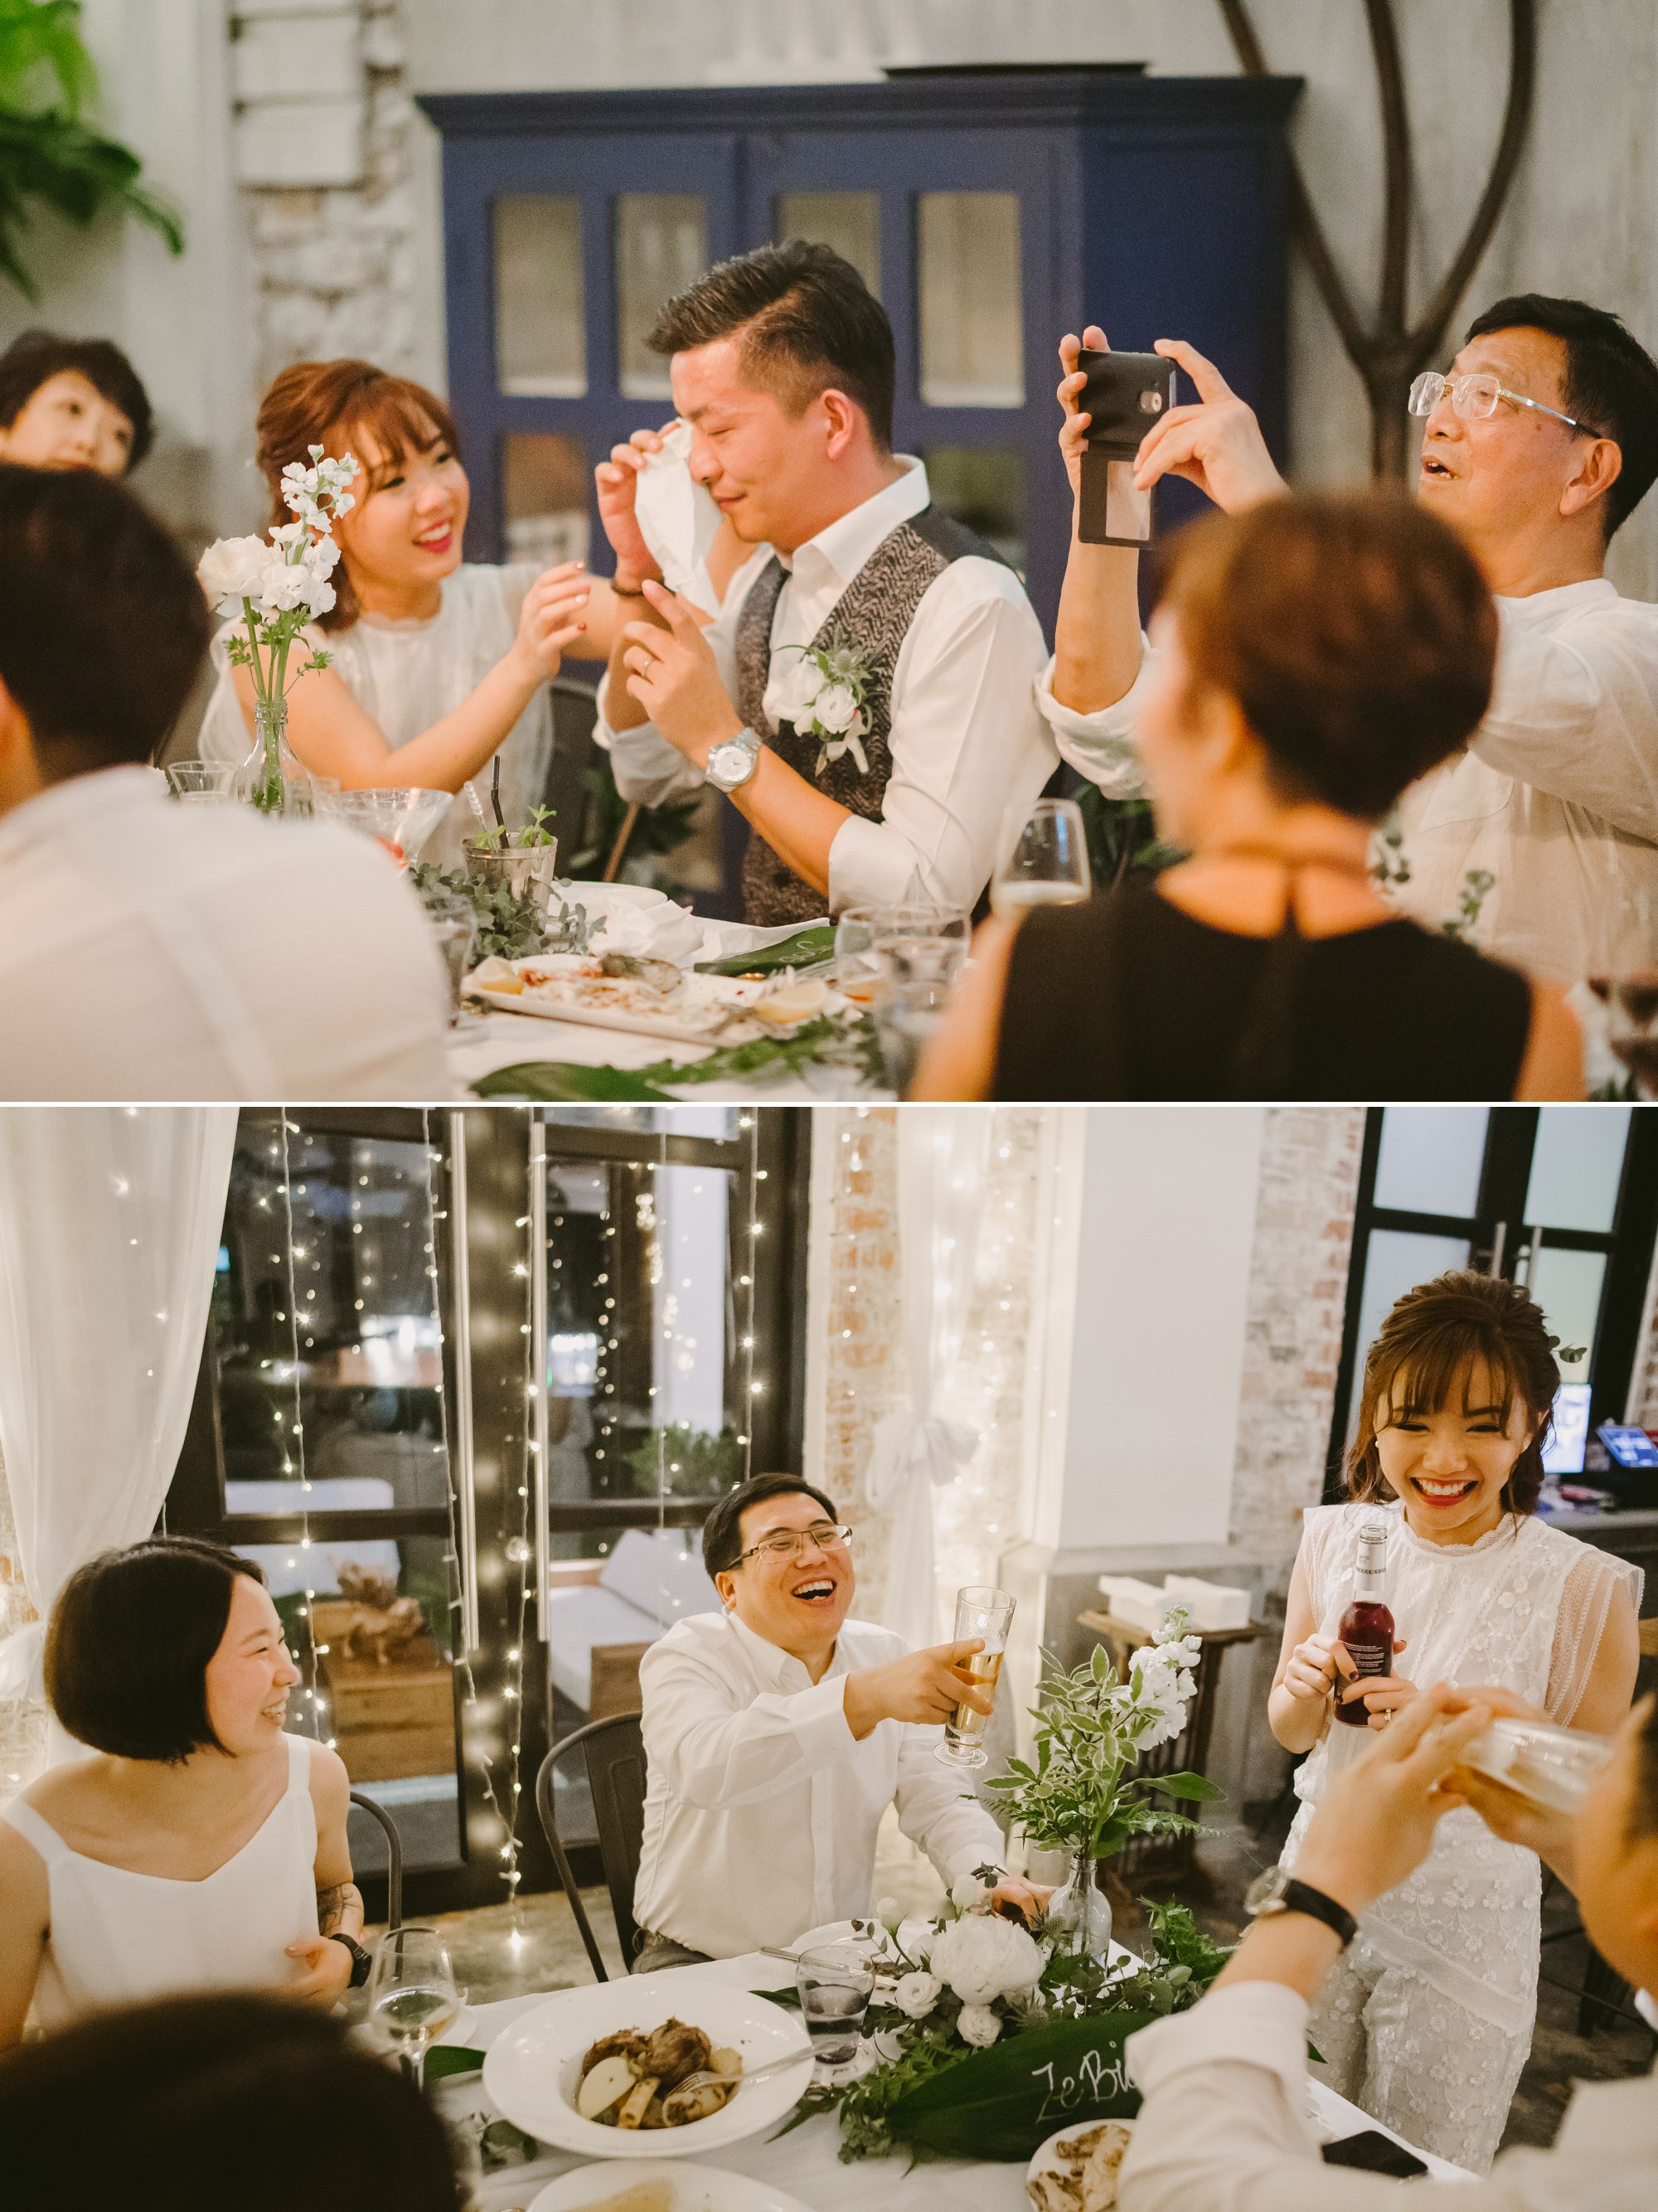 wedding_photography 37.jpg